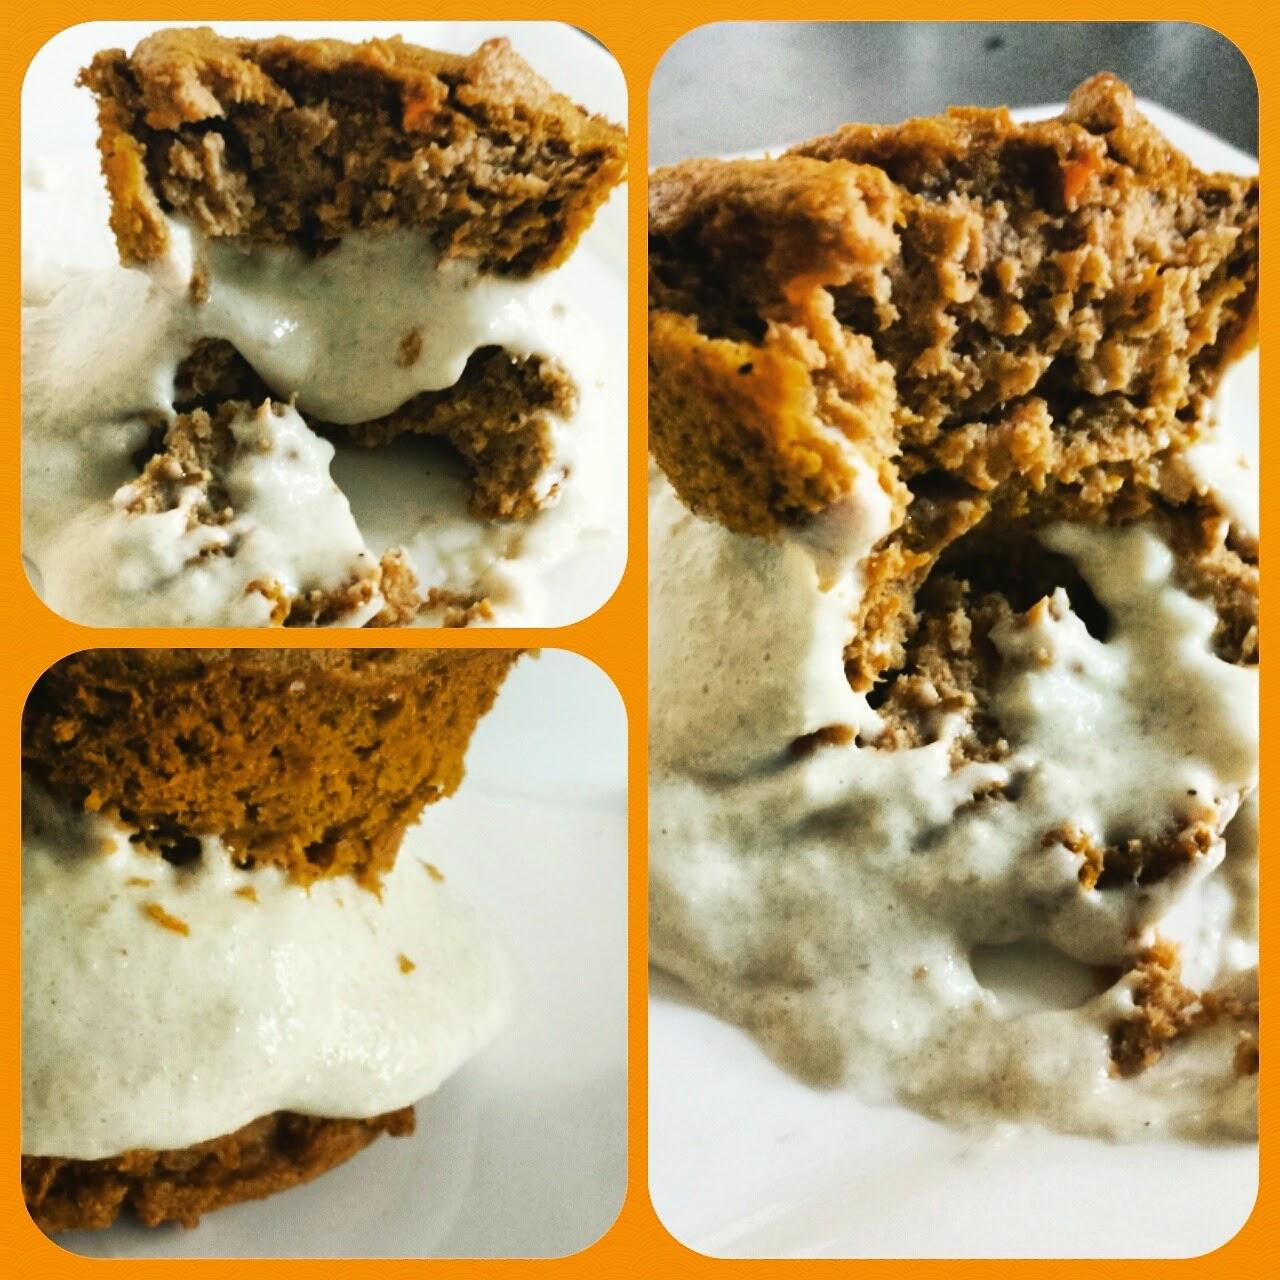 Healthilicious Life - Messy Protein Cake